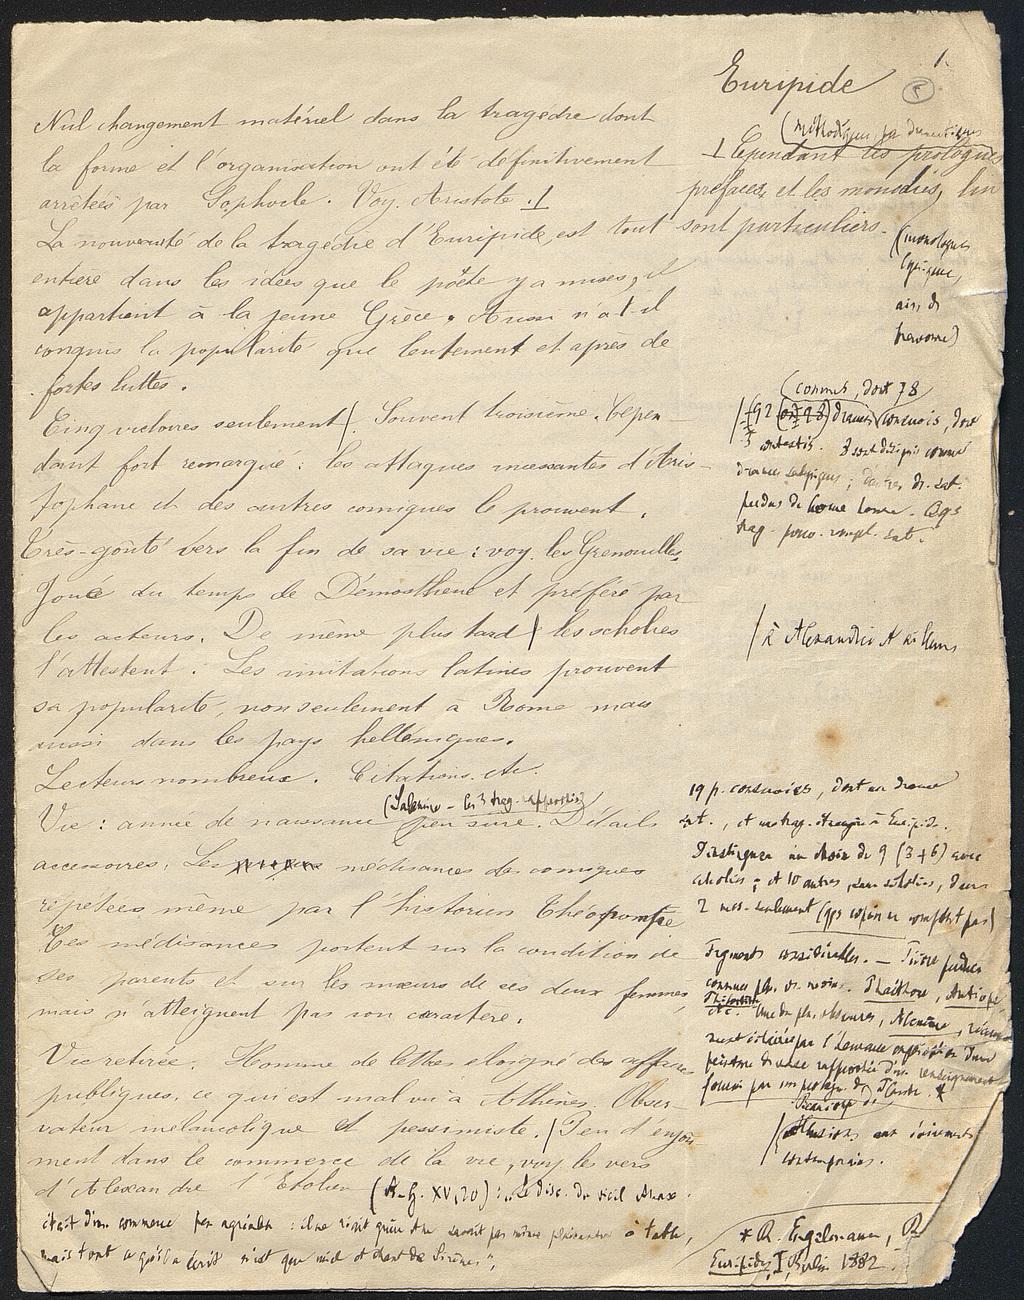 [folio 5 : foliotation de la main de bibliothécaire]